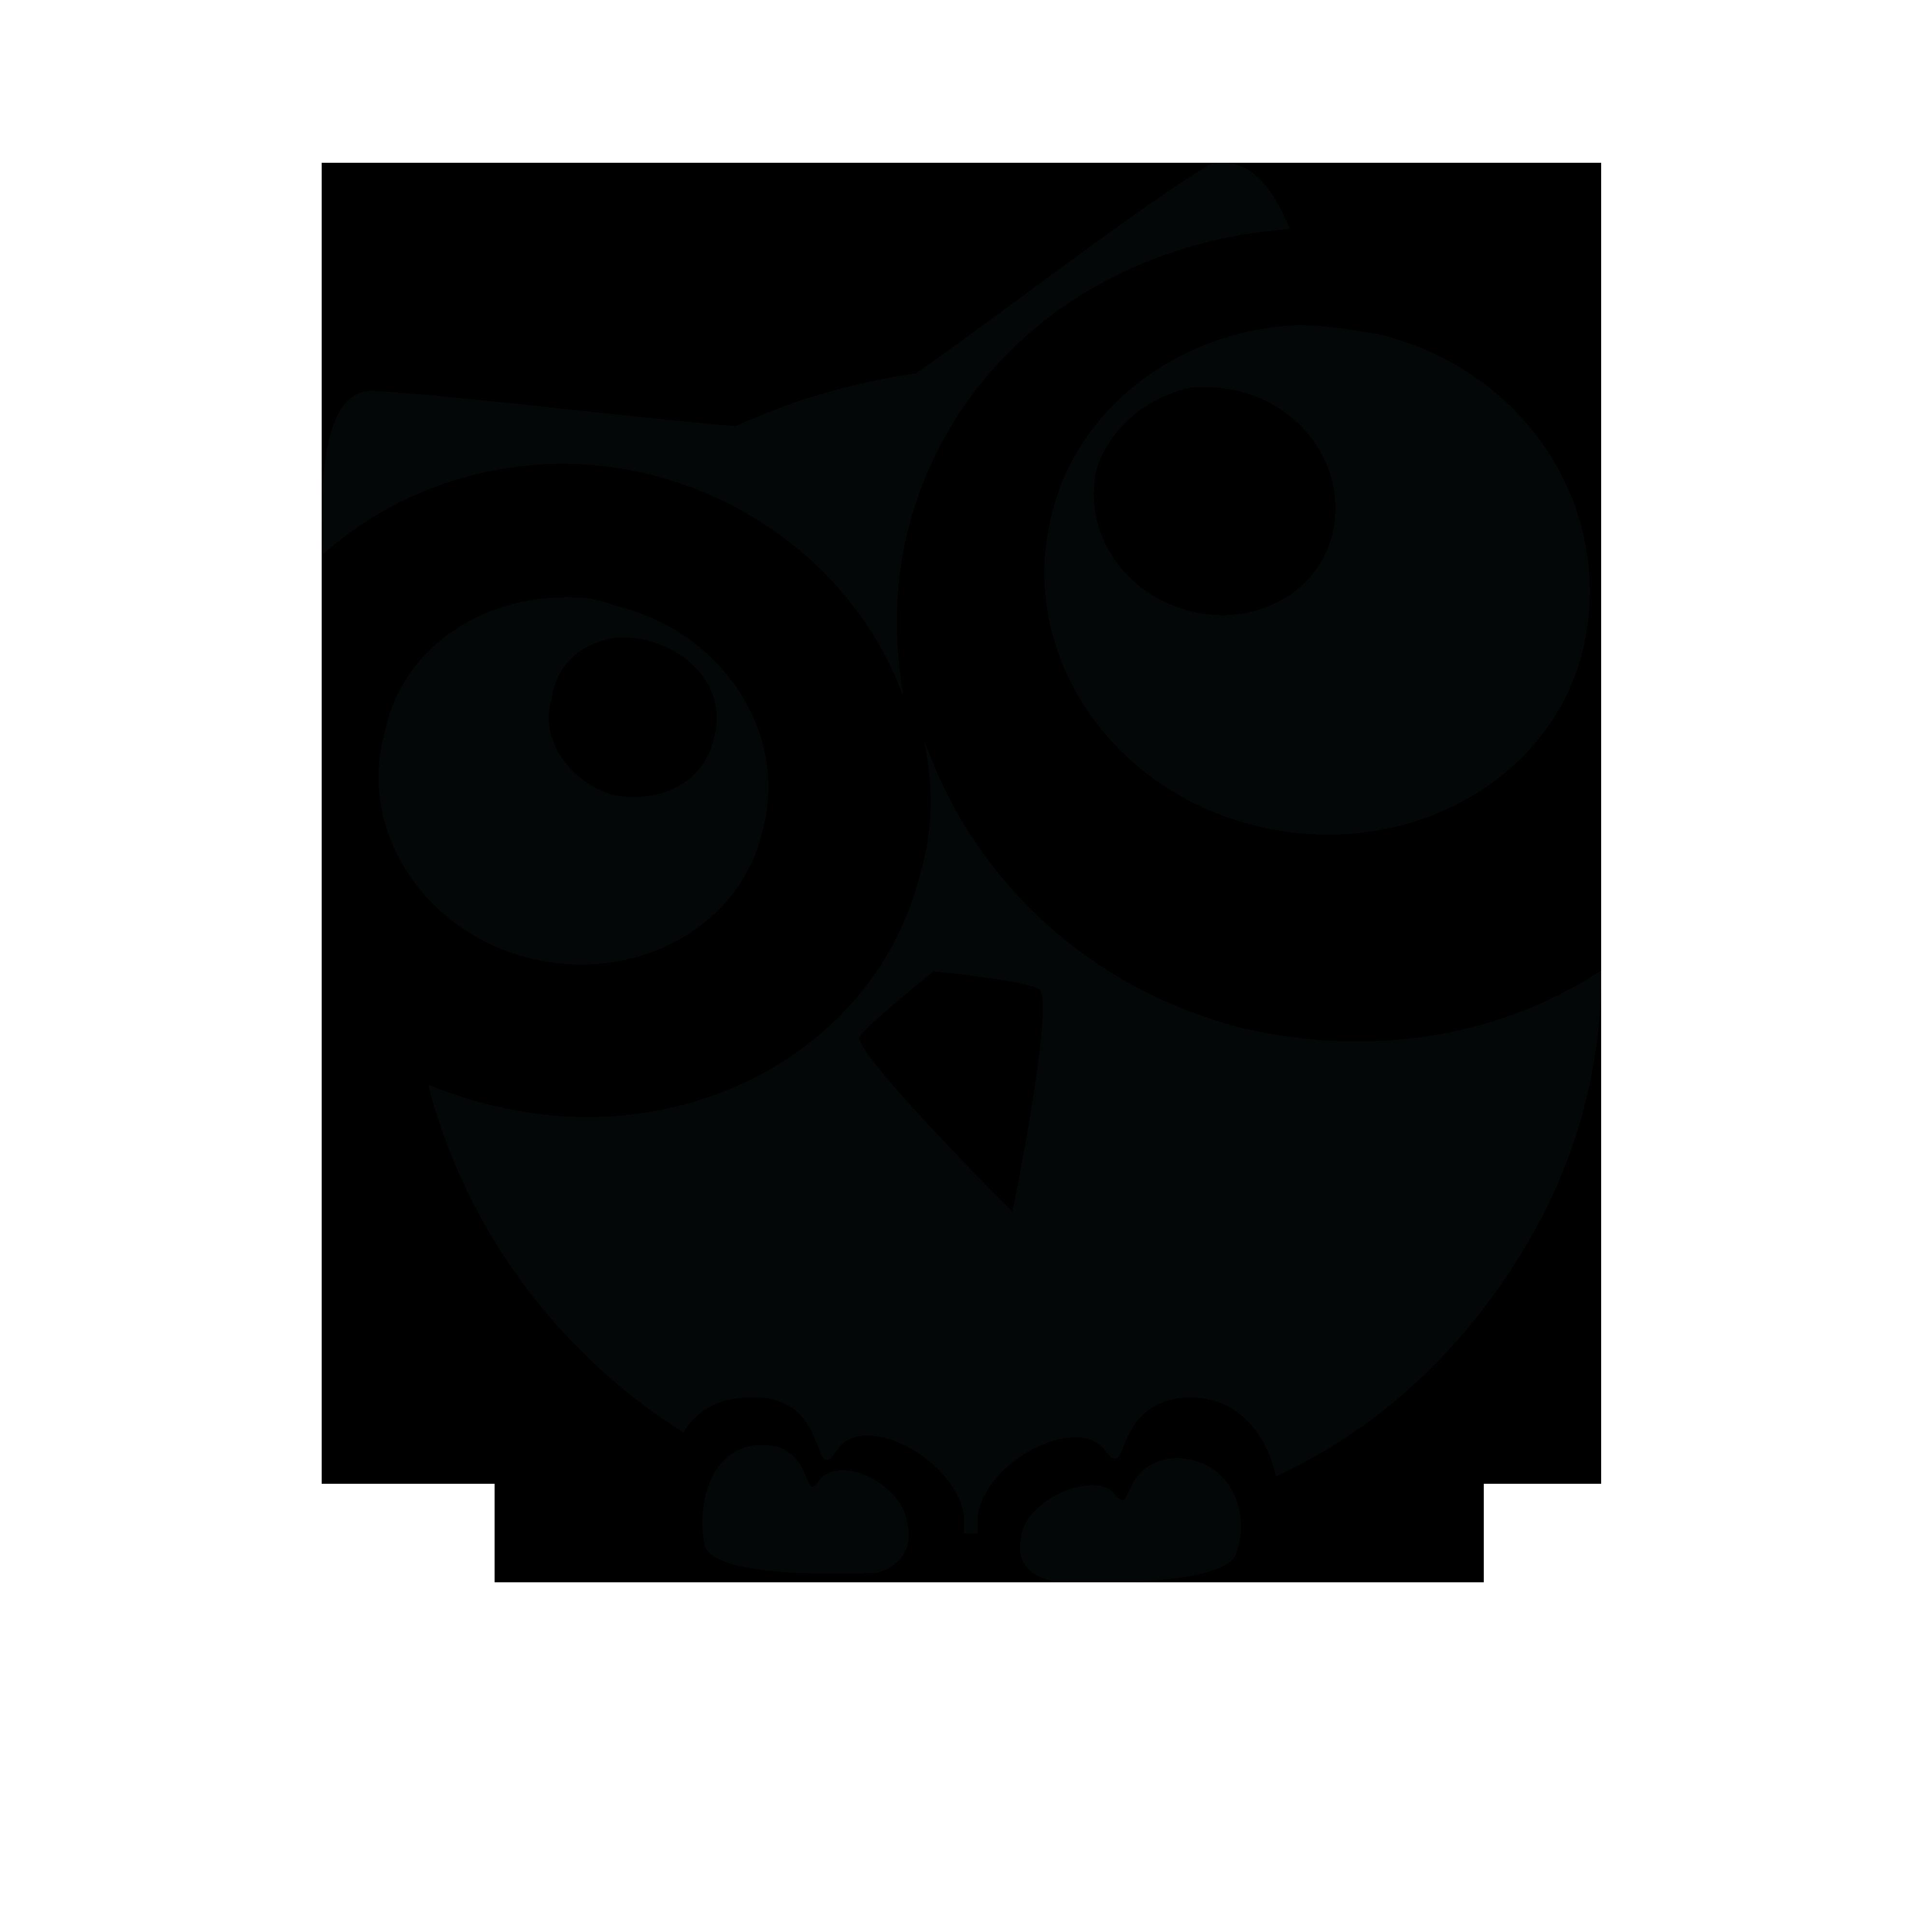 Tree branch clipart black and white banner transparent download Owl On Tree Branch Clip Art at - vector clip art online - Hanslodge ... banner transparent download